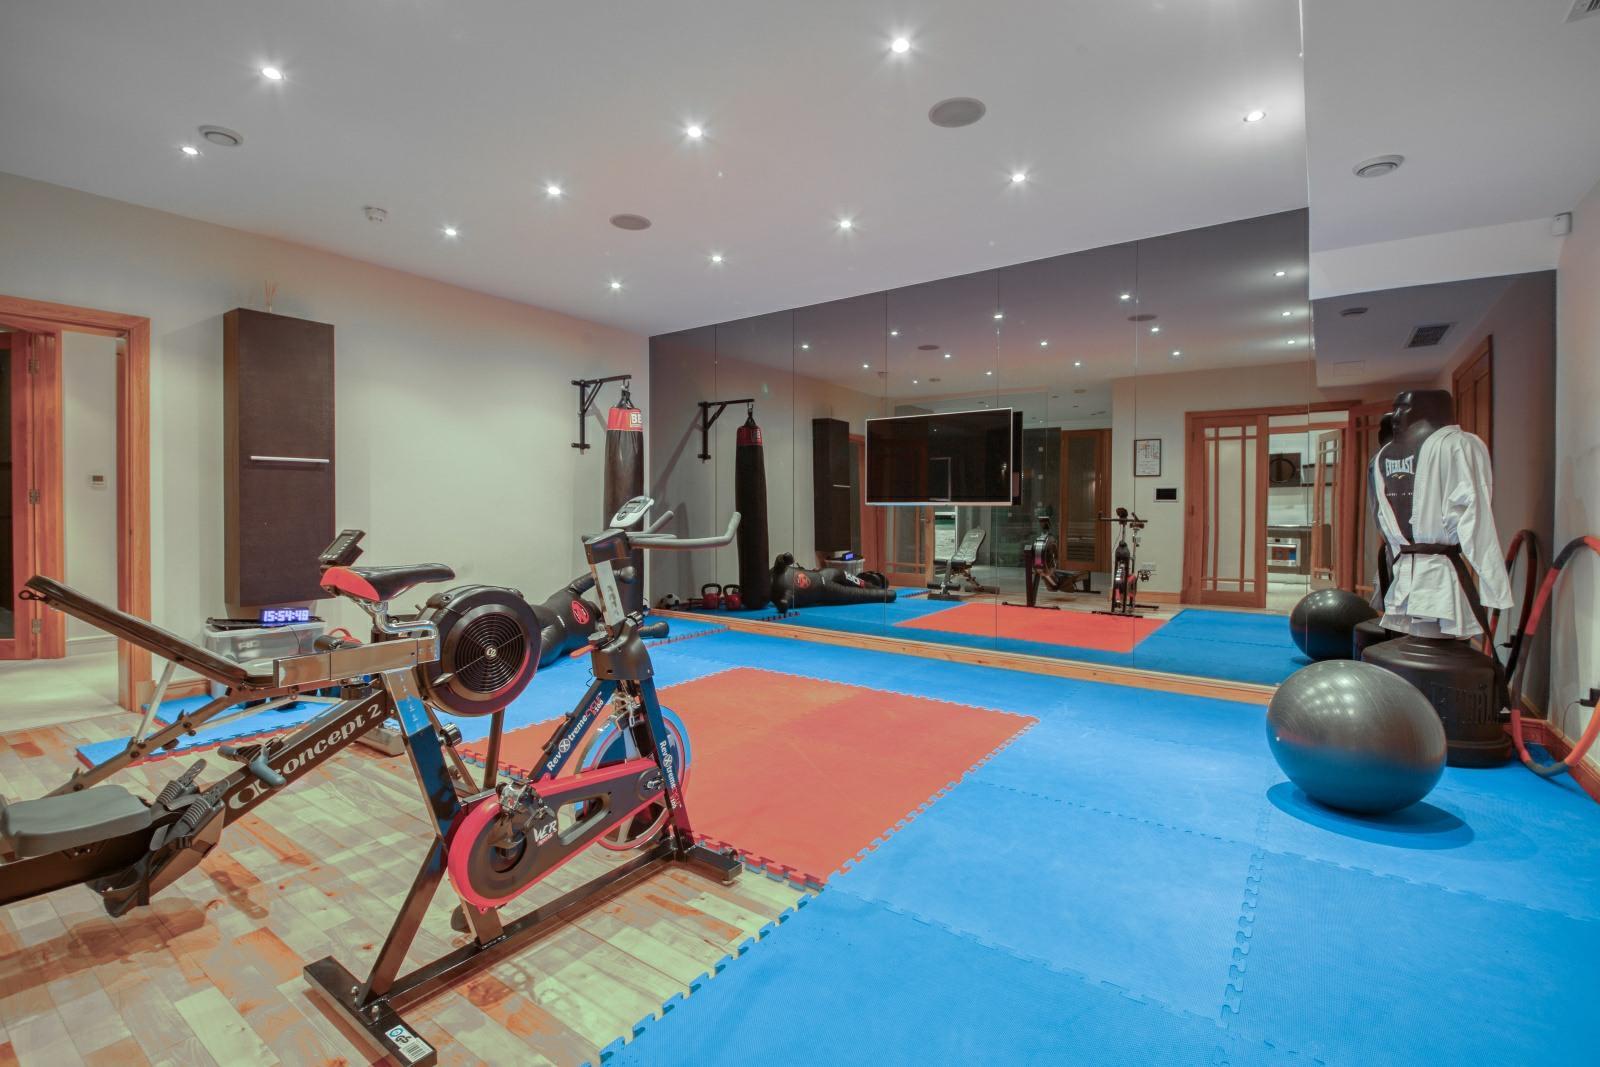 Kingston upon Thames, Surrey, 6 Bedrooms, Home Gym